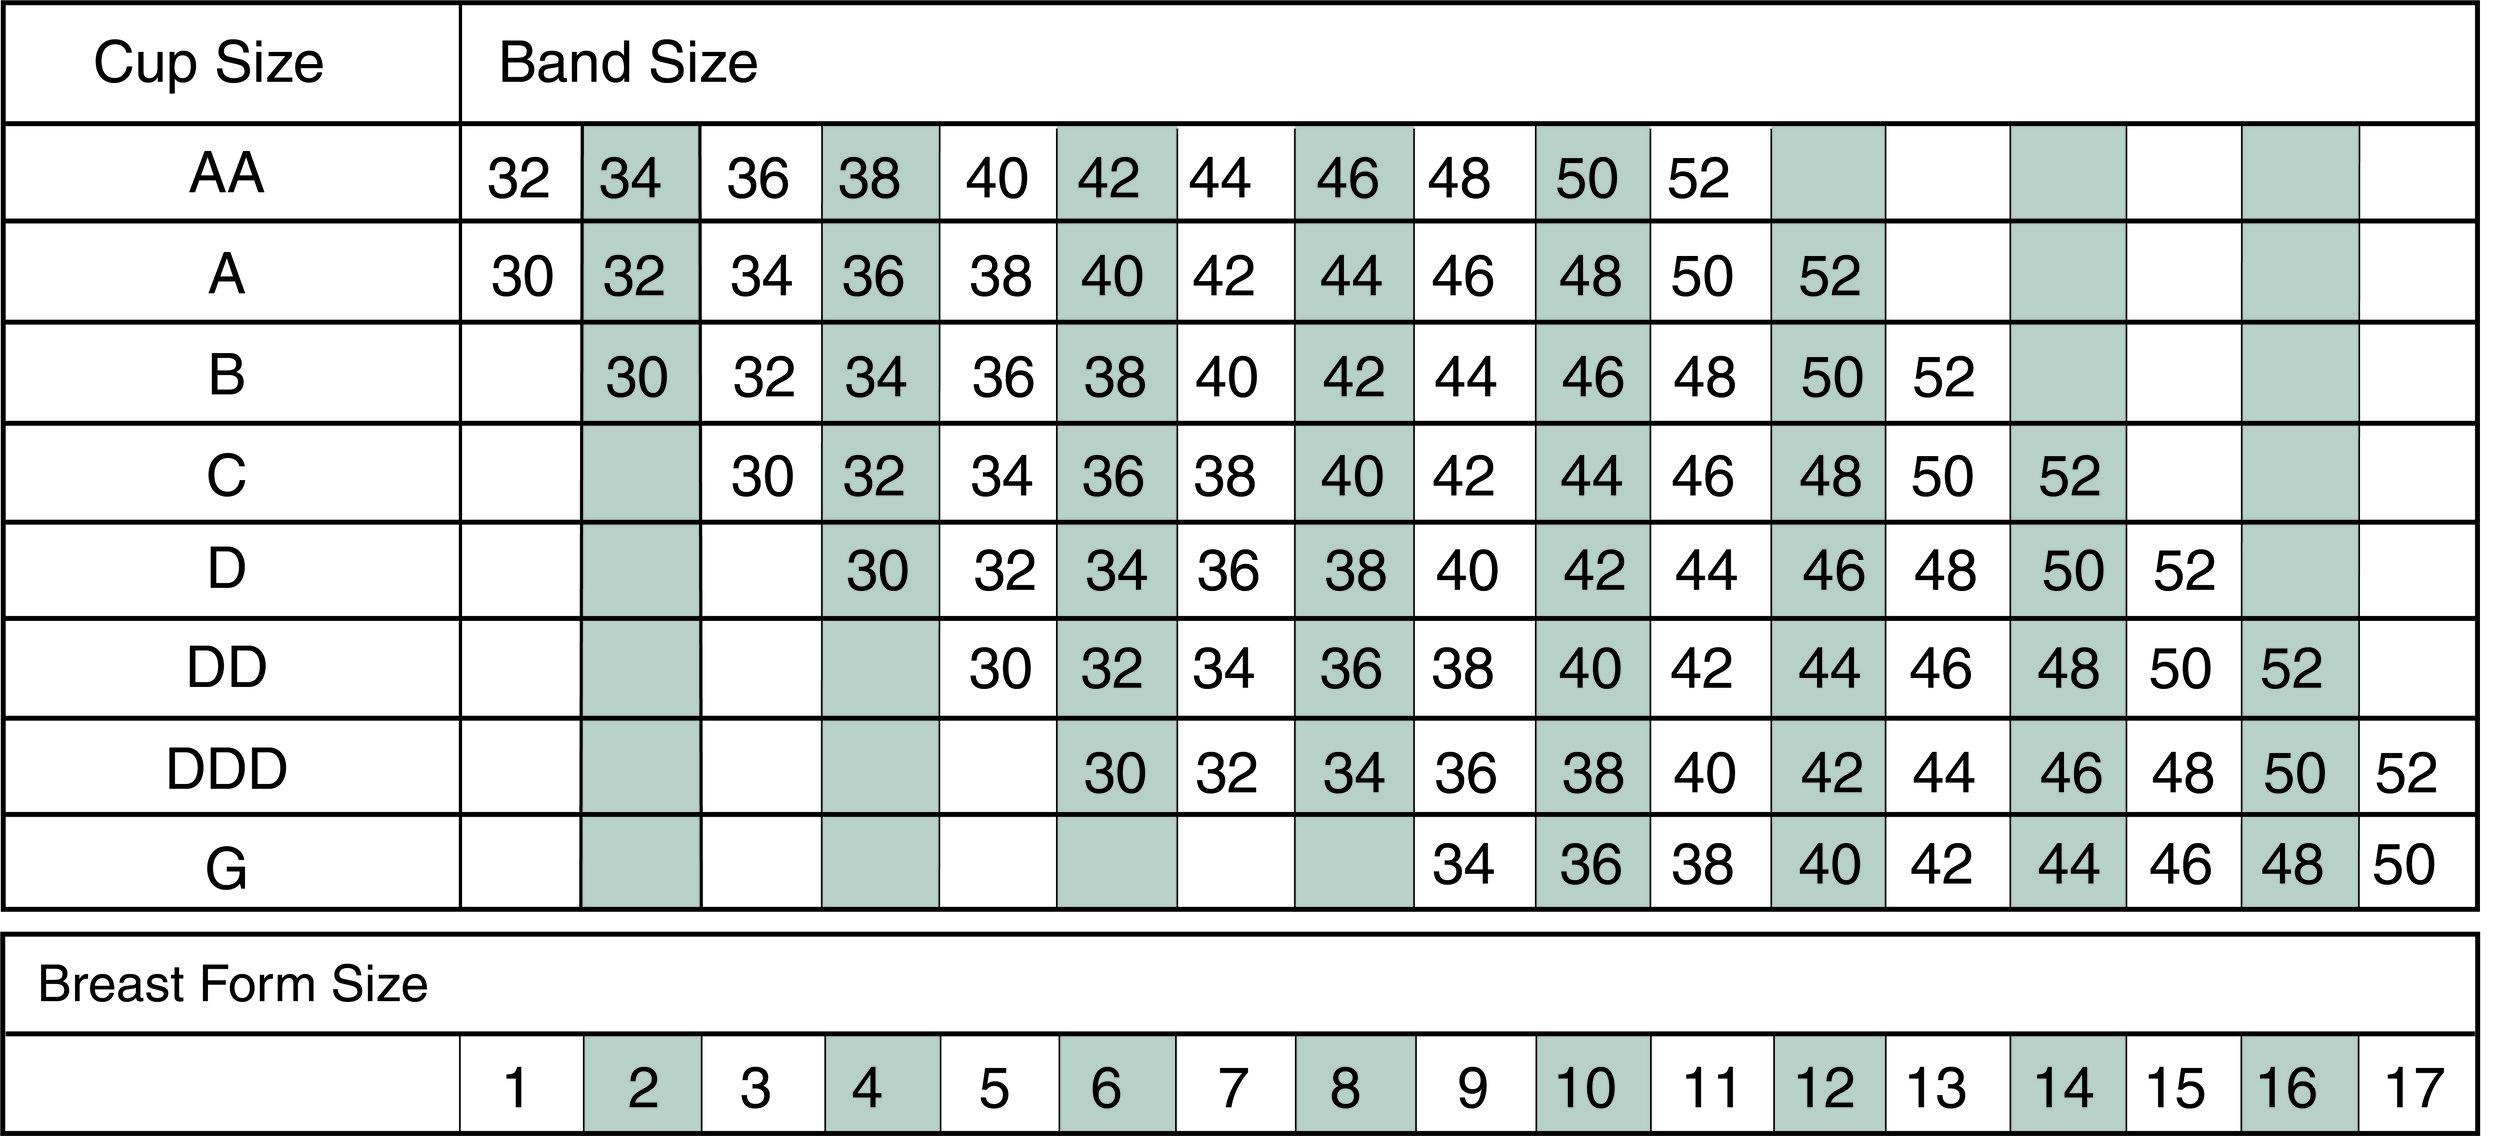 New Bra Size Chart.jpg